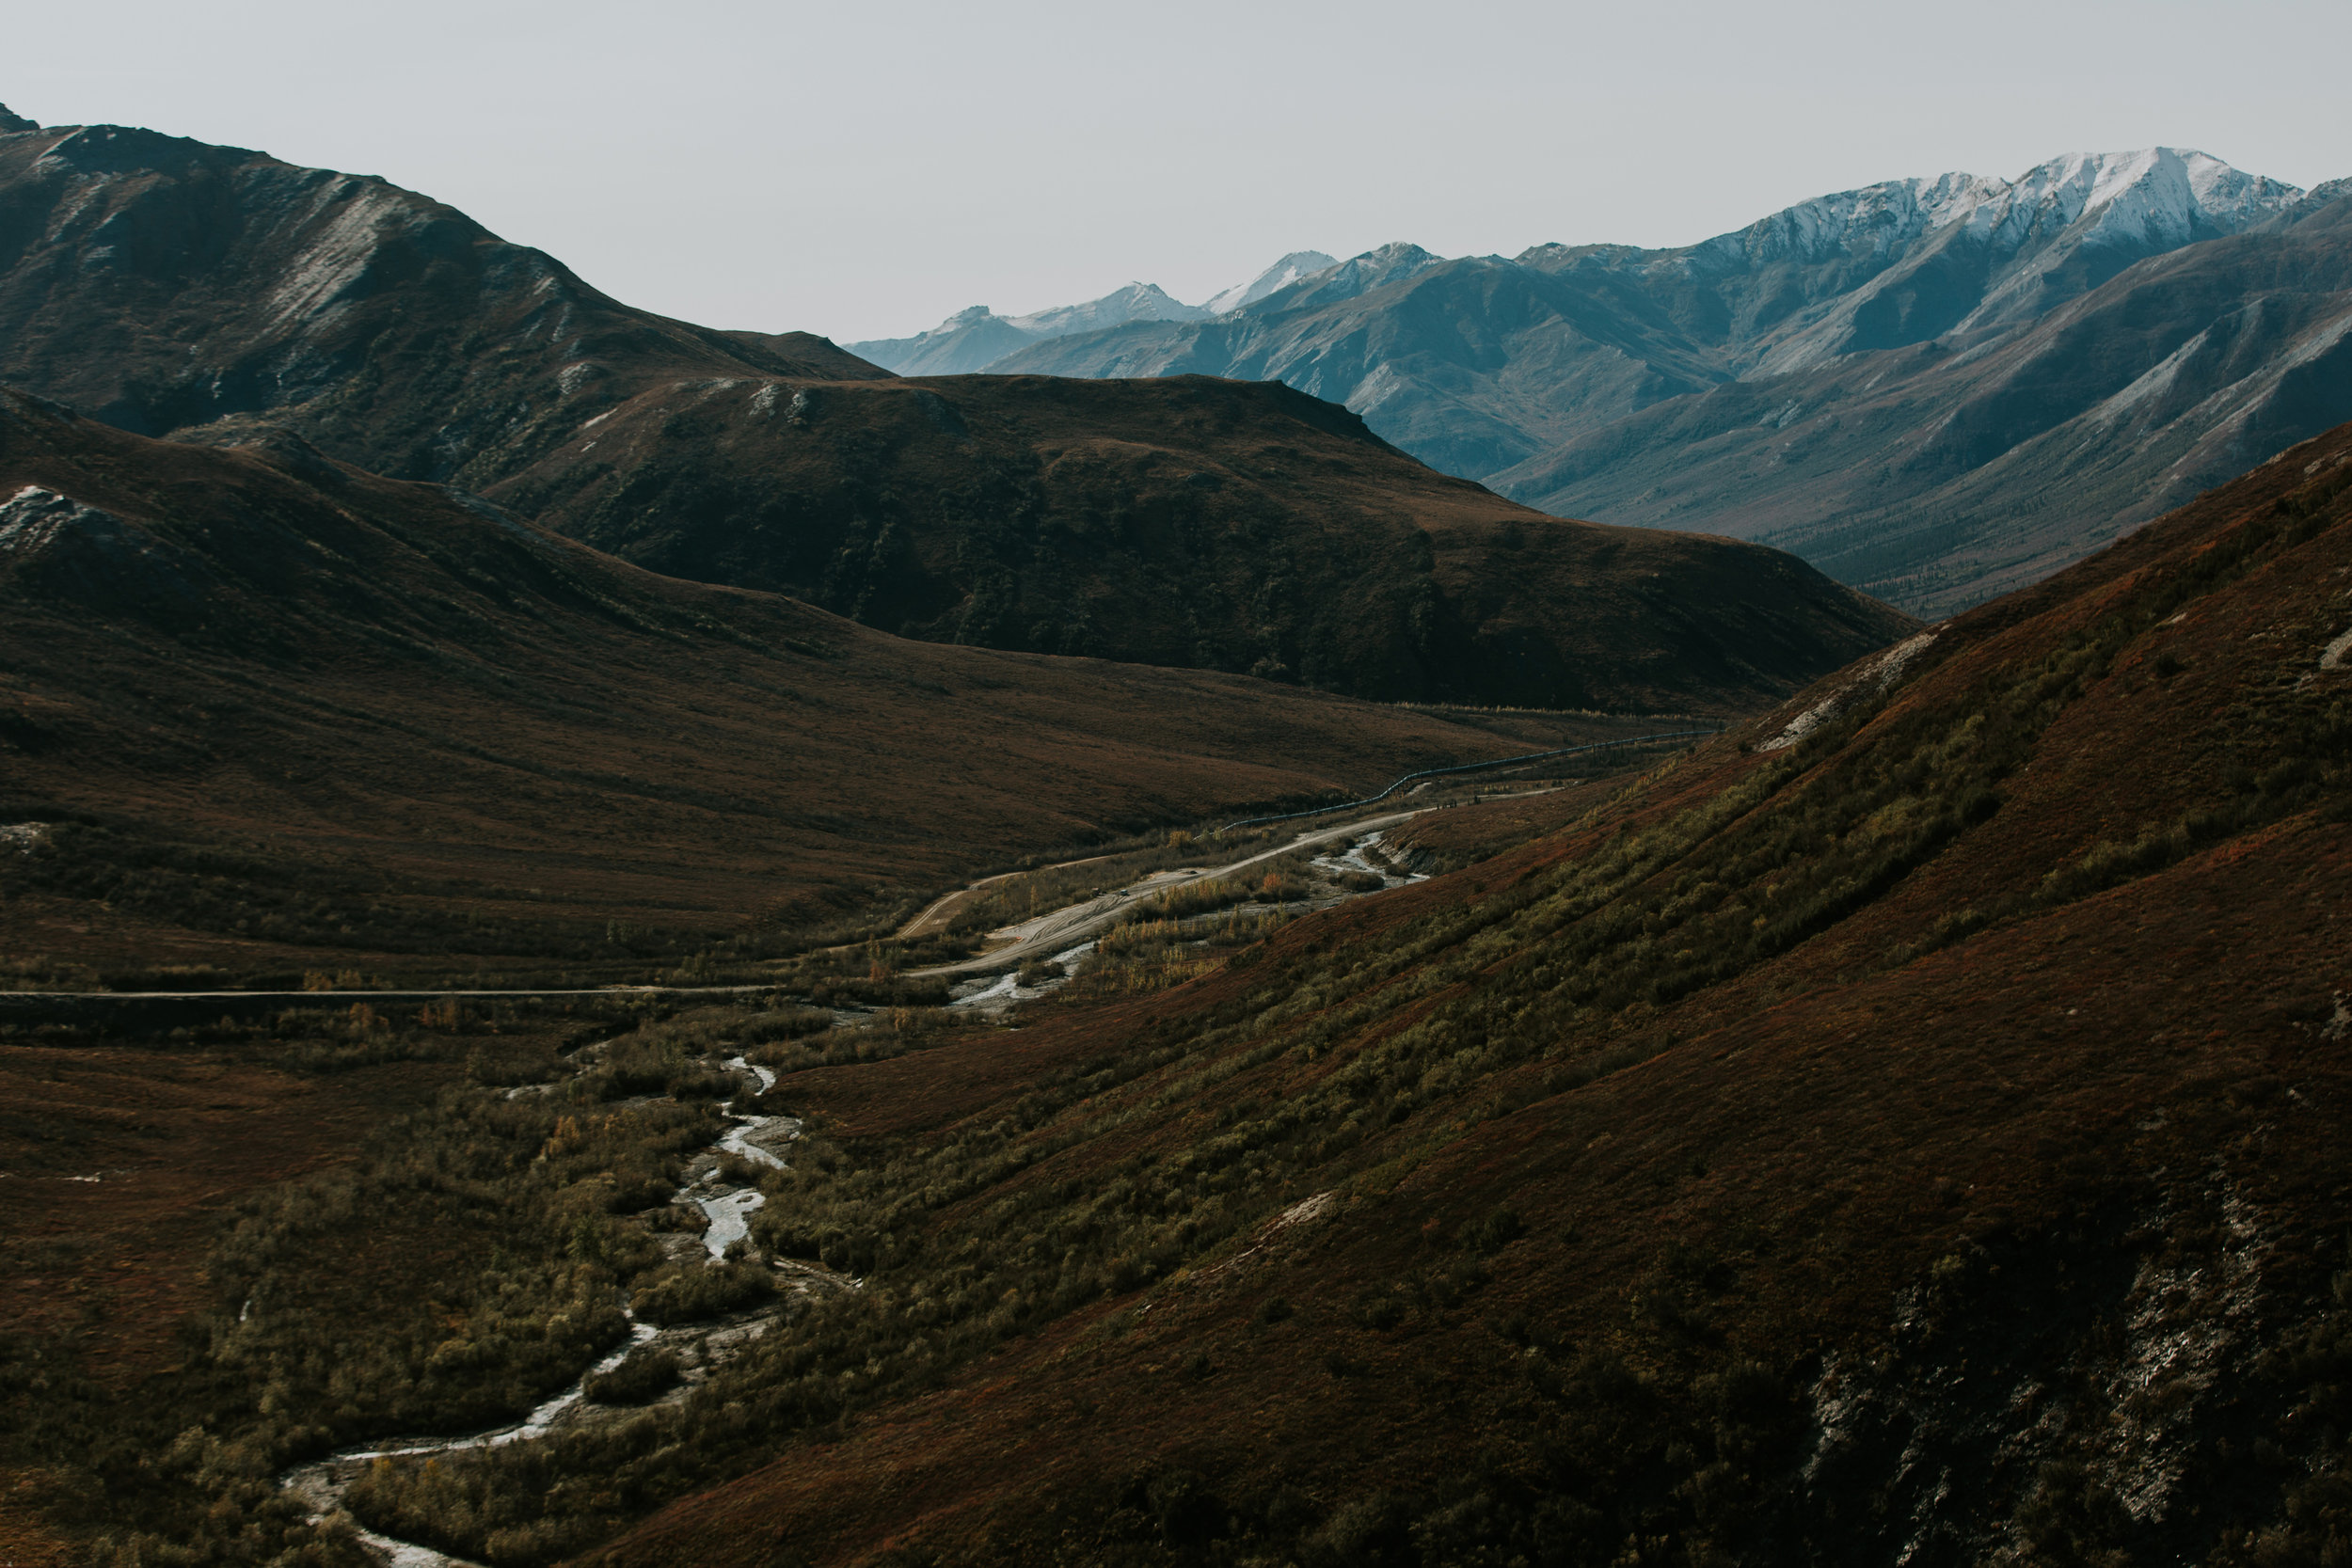 CindyGiovagnoli_Alaska_KoyukukRiver_SukakpakMountain_JimRiver_ArcticCircle_fly_fishing_September-006.jpg